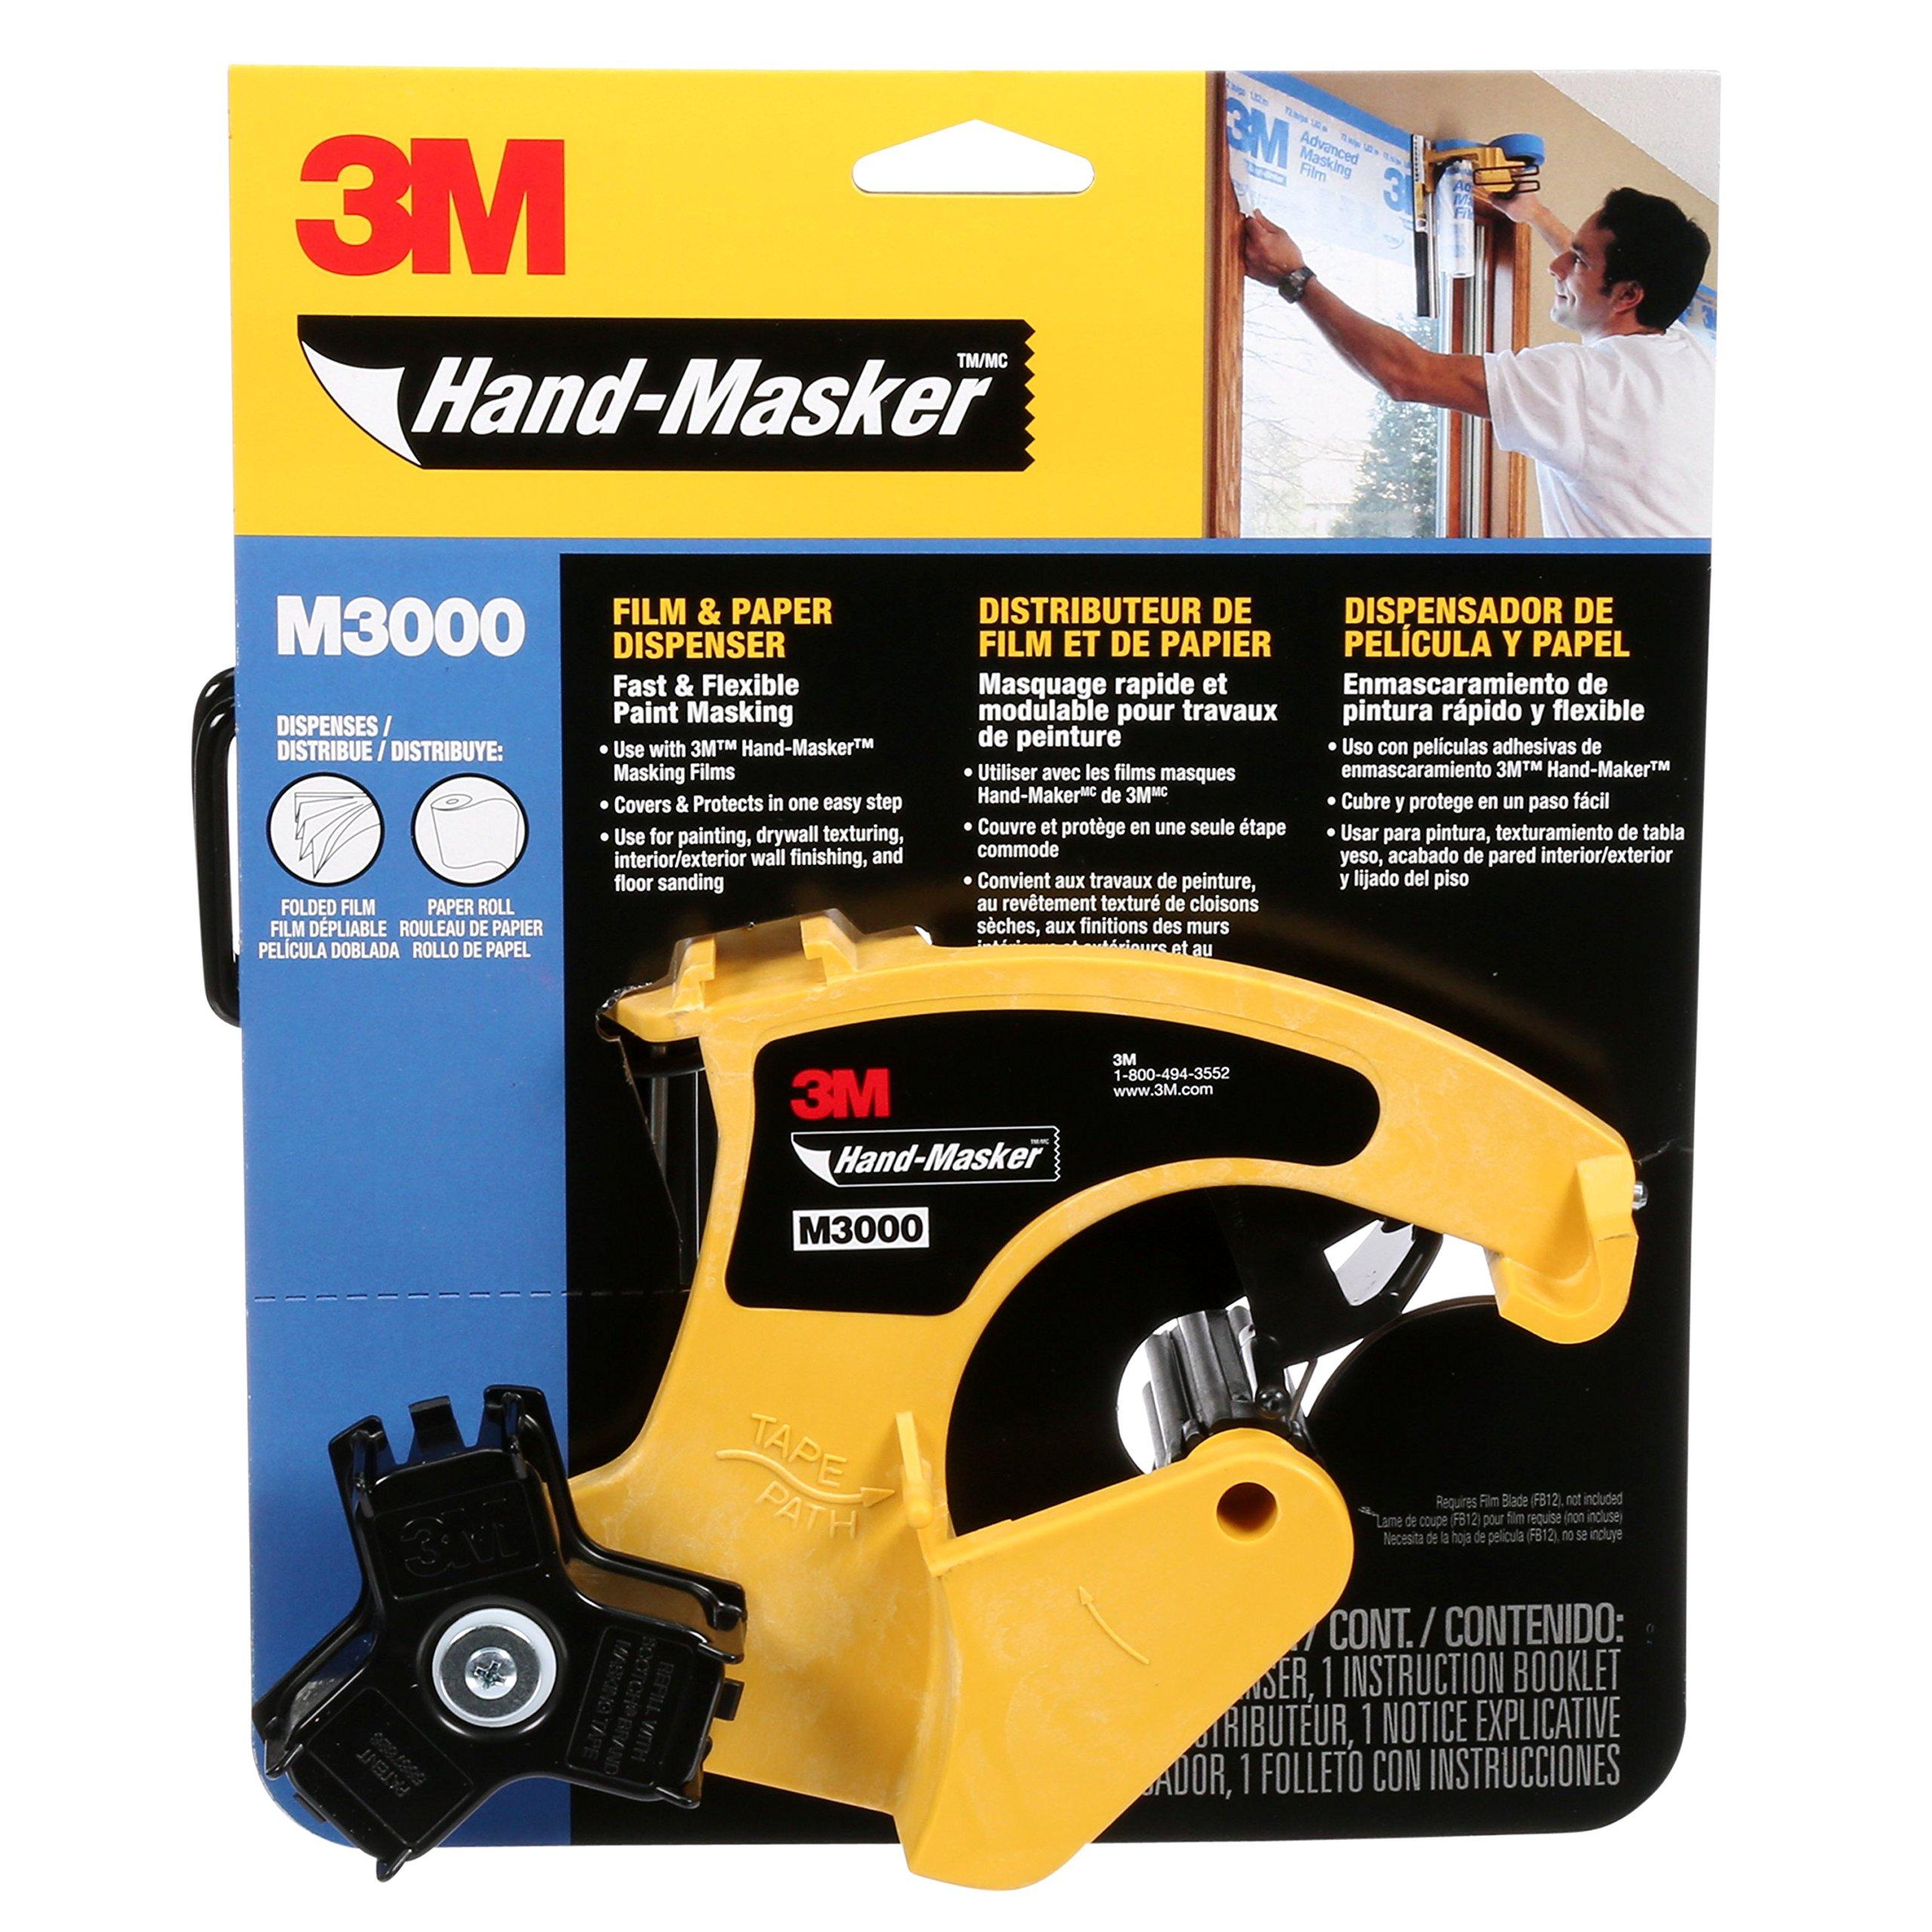 3M Hand-Masker Dispenser by 3M